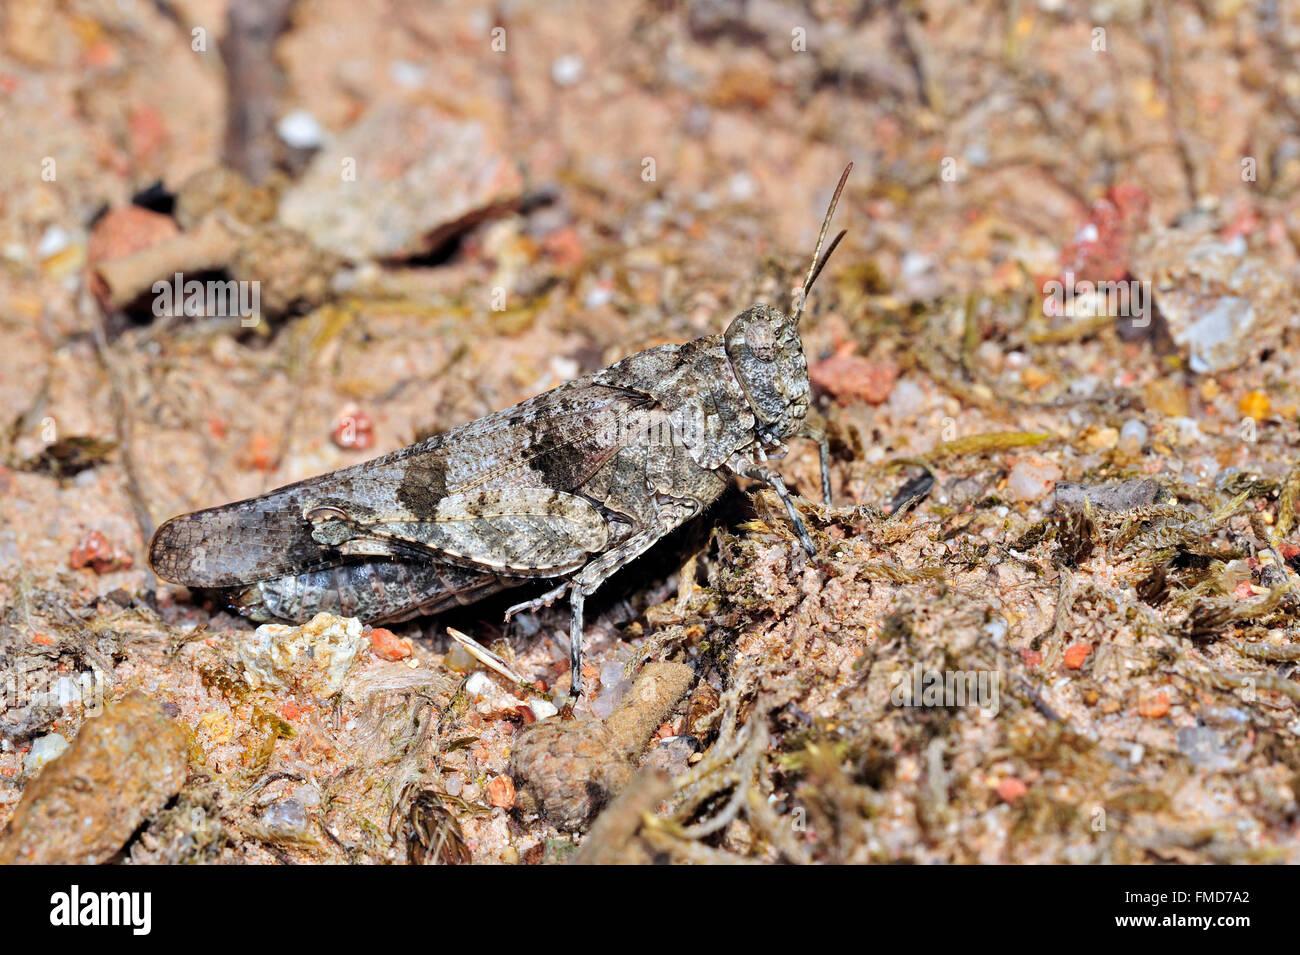 Blue-winged grasshopper (Oedipoda caerulescens) merging into arid environment - Stock Image